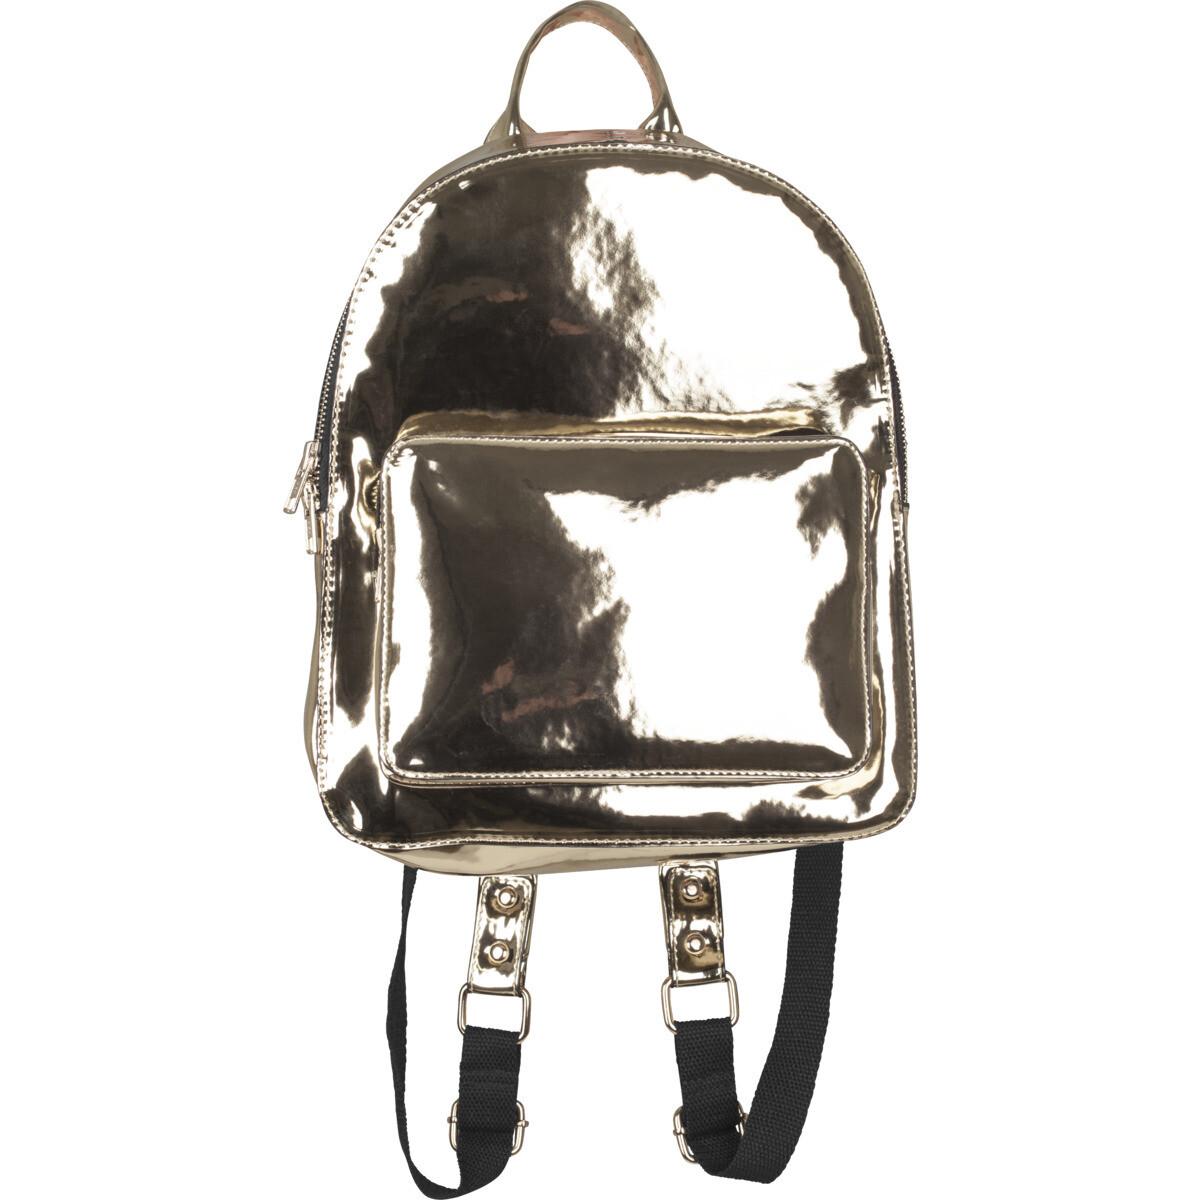 Midi Metallic Backpack - Gold